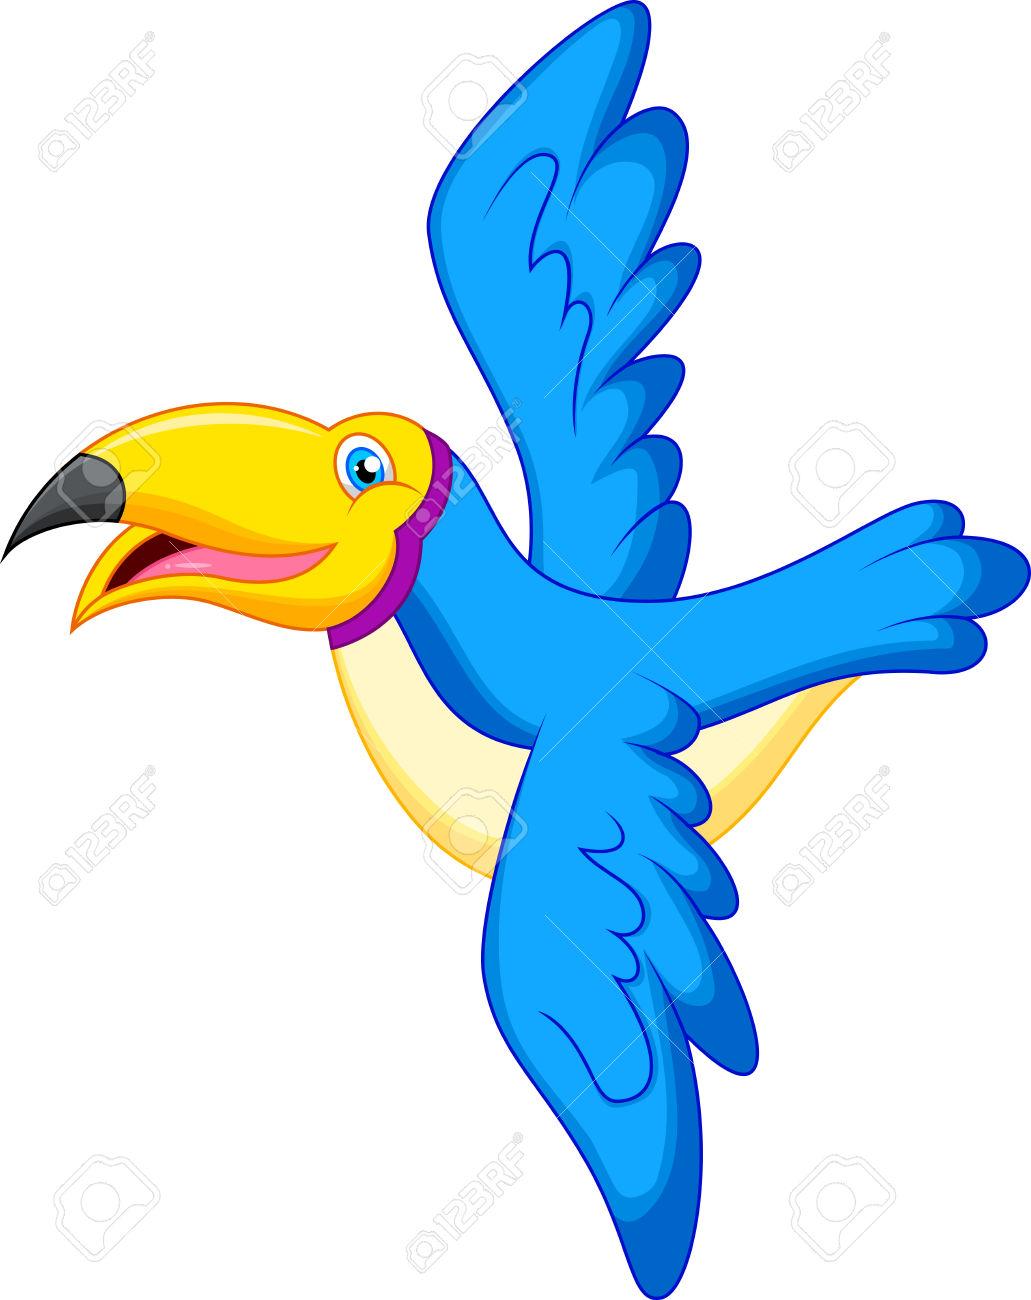 Blur clipart toucan Animal clipart no Blue no